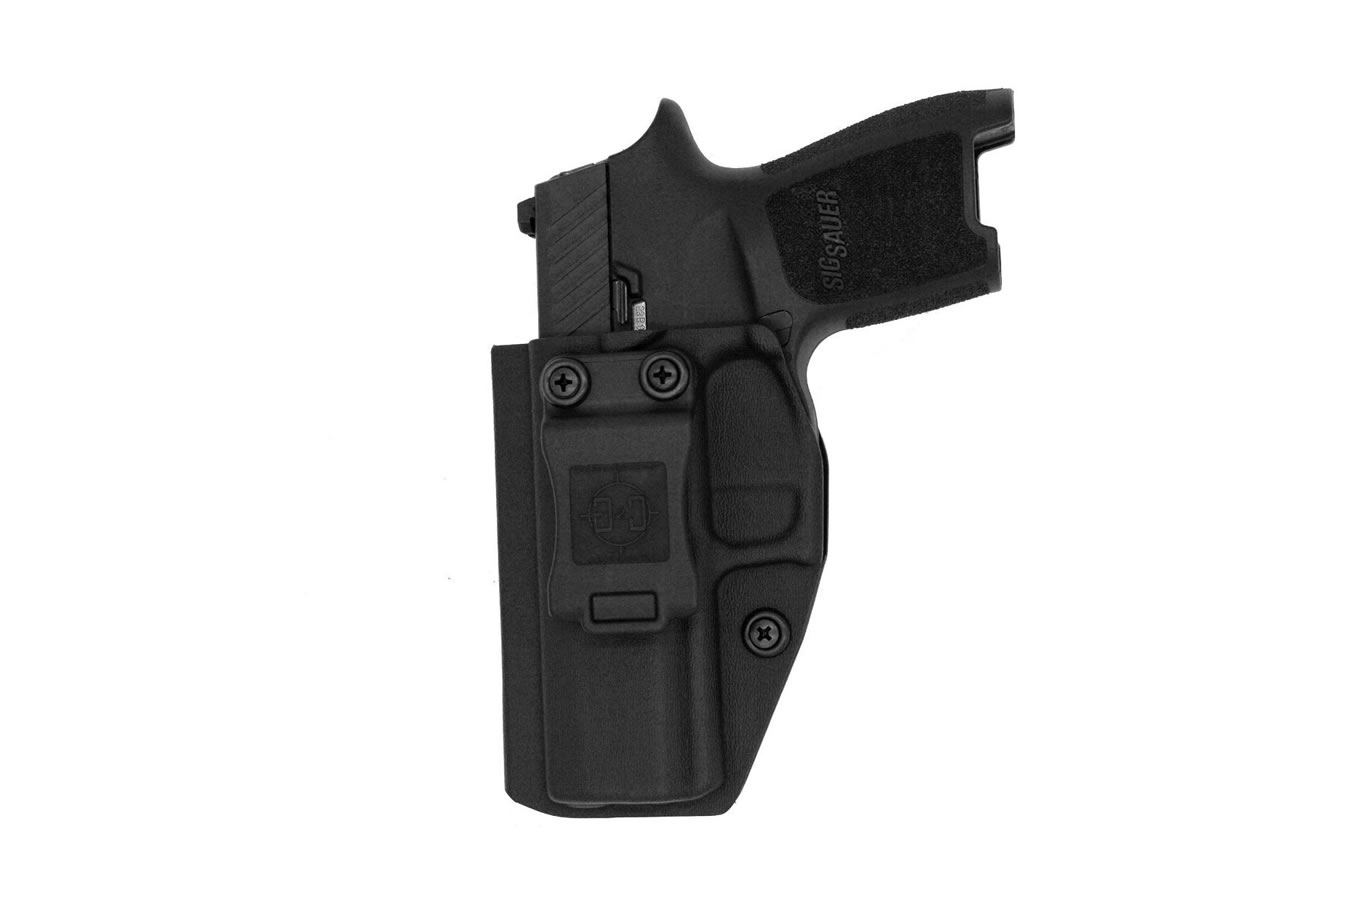 SIG P320C - IWB Covert Kydex Holster - Left Handed